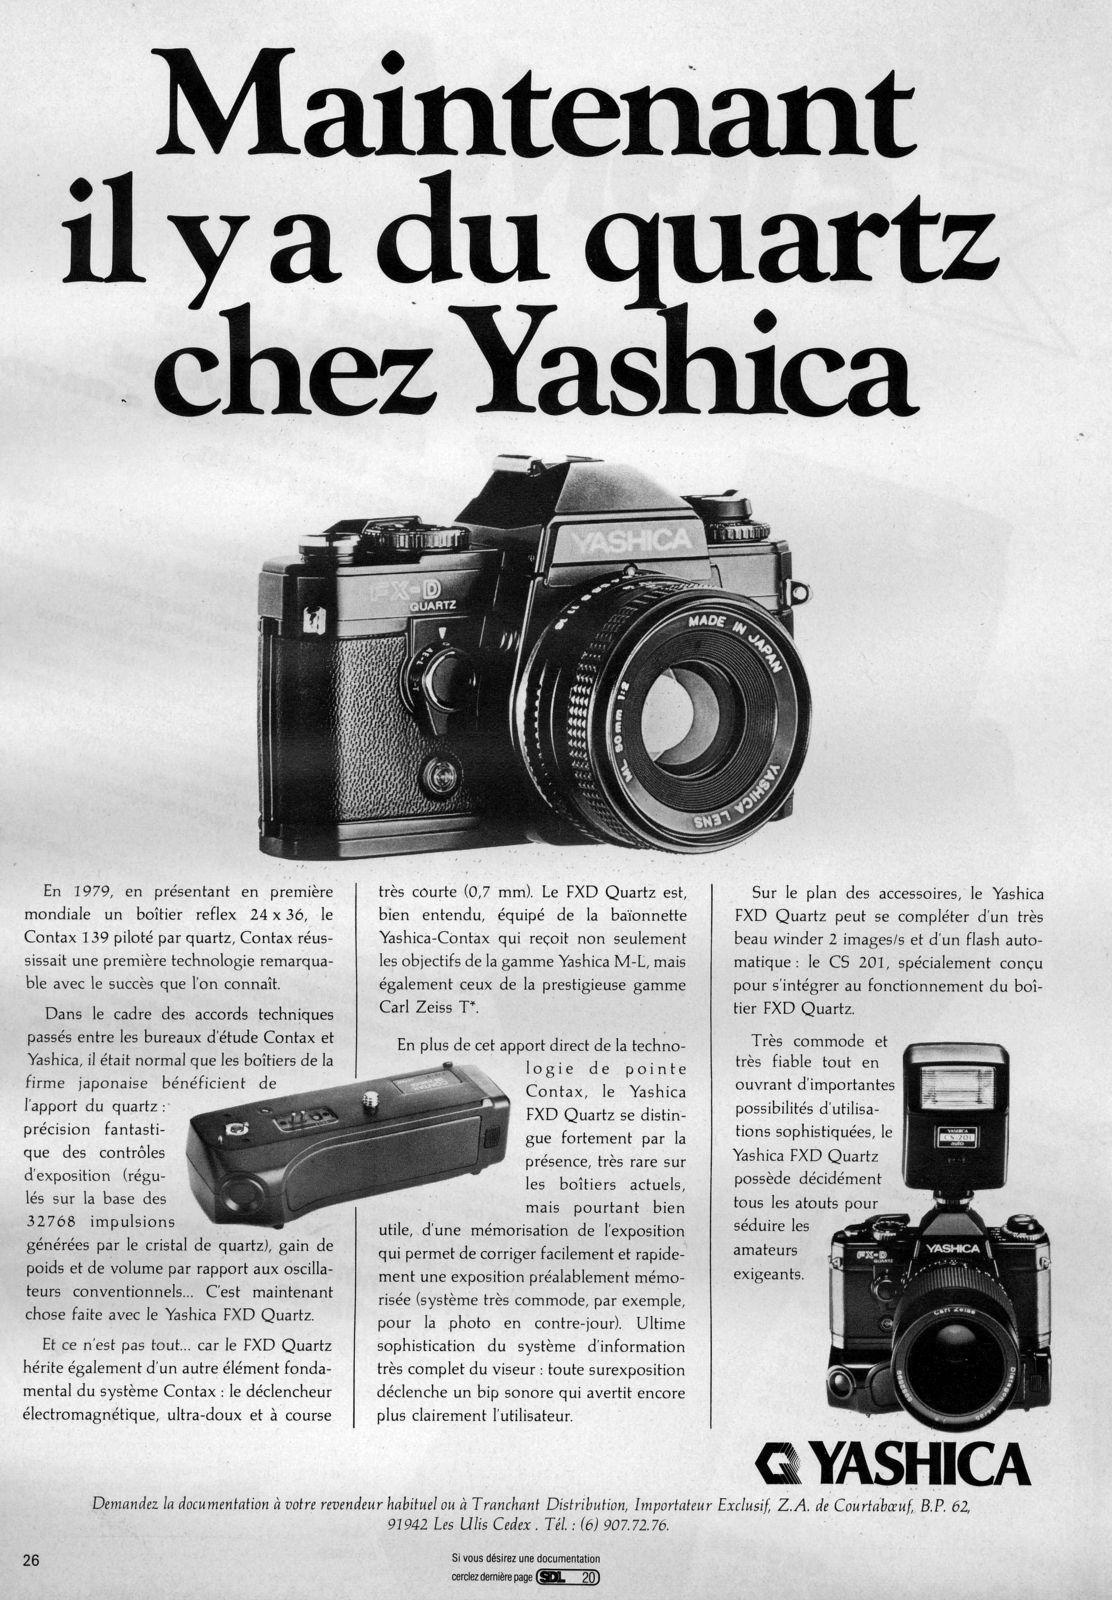 Yashica FXD quartz.